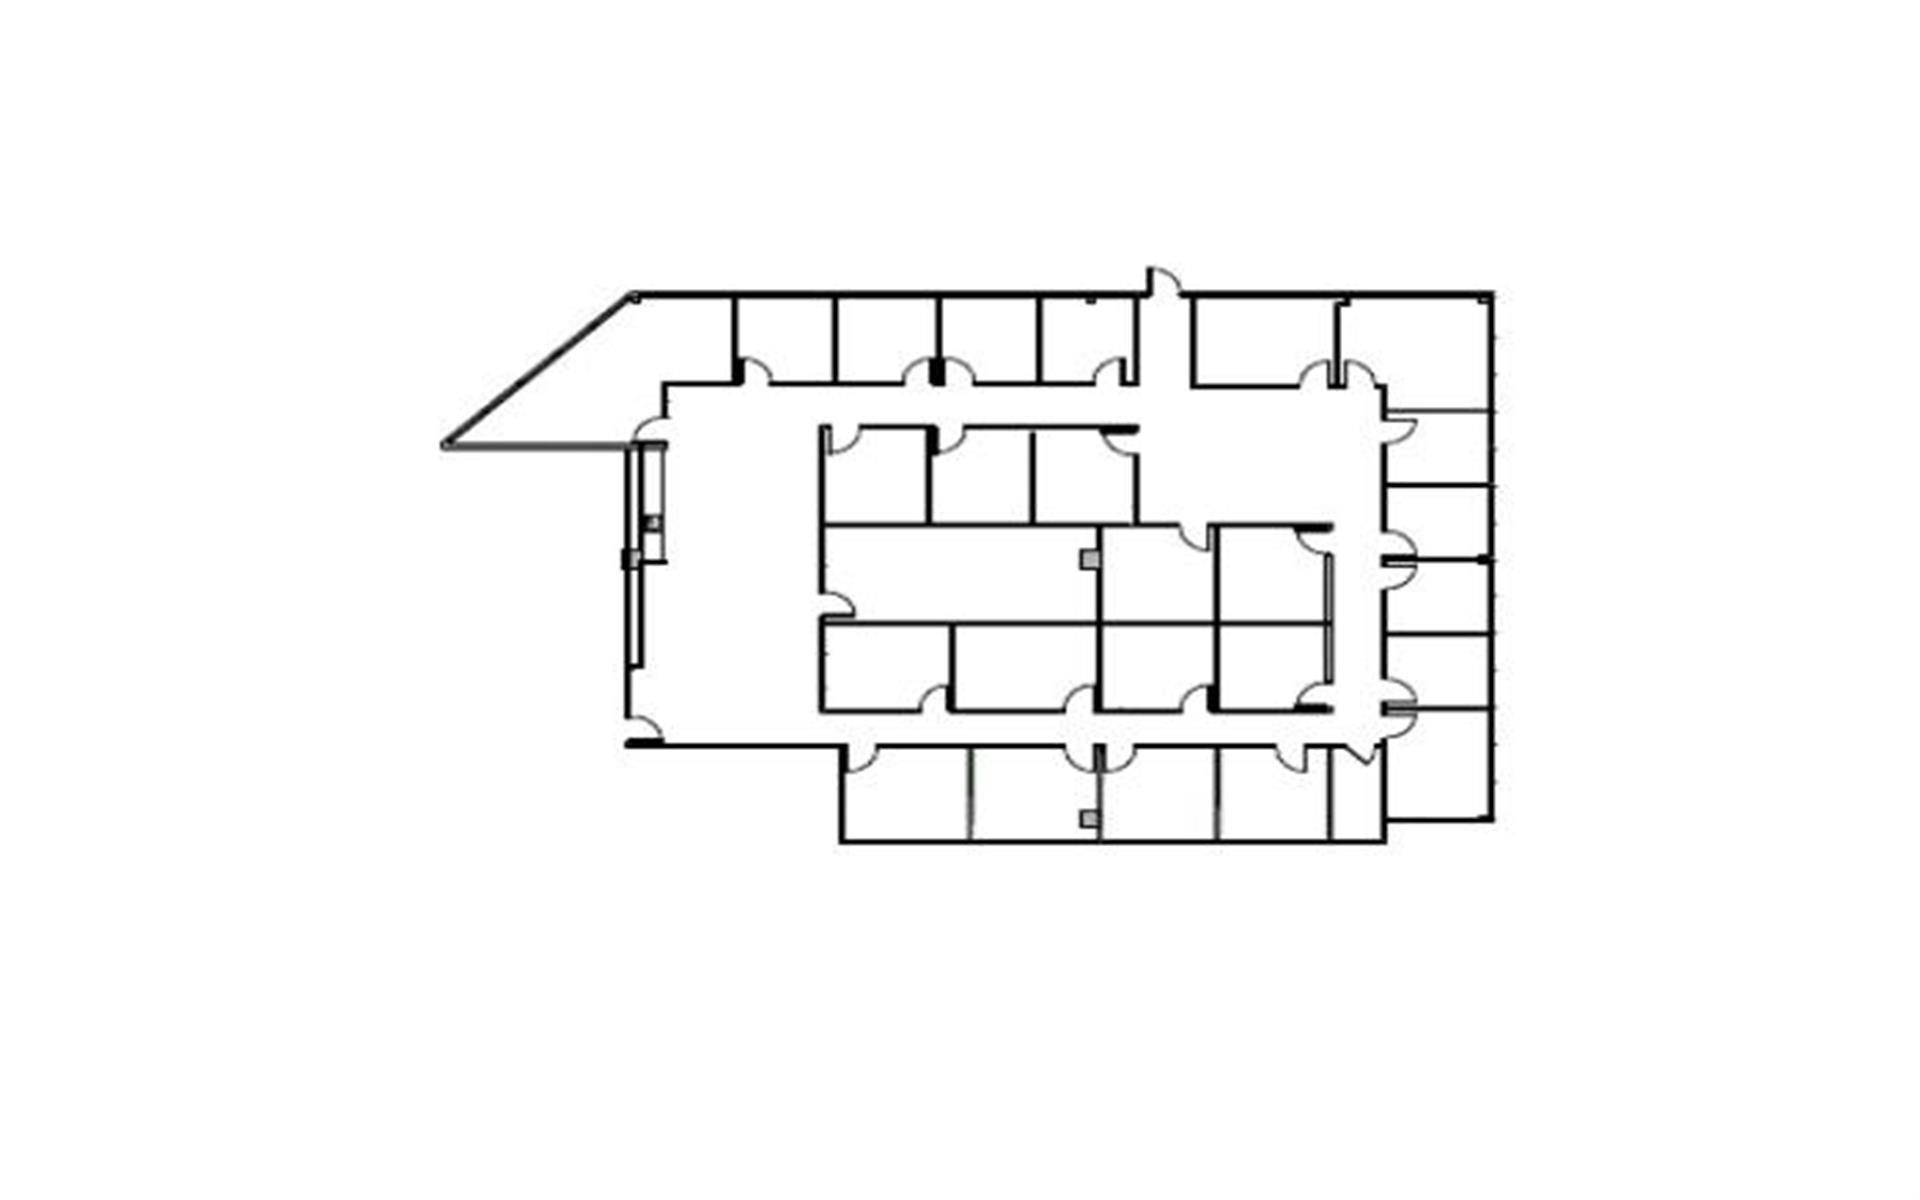 Boxer - 340 North Belt - Team Office | Suite A110.01